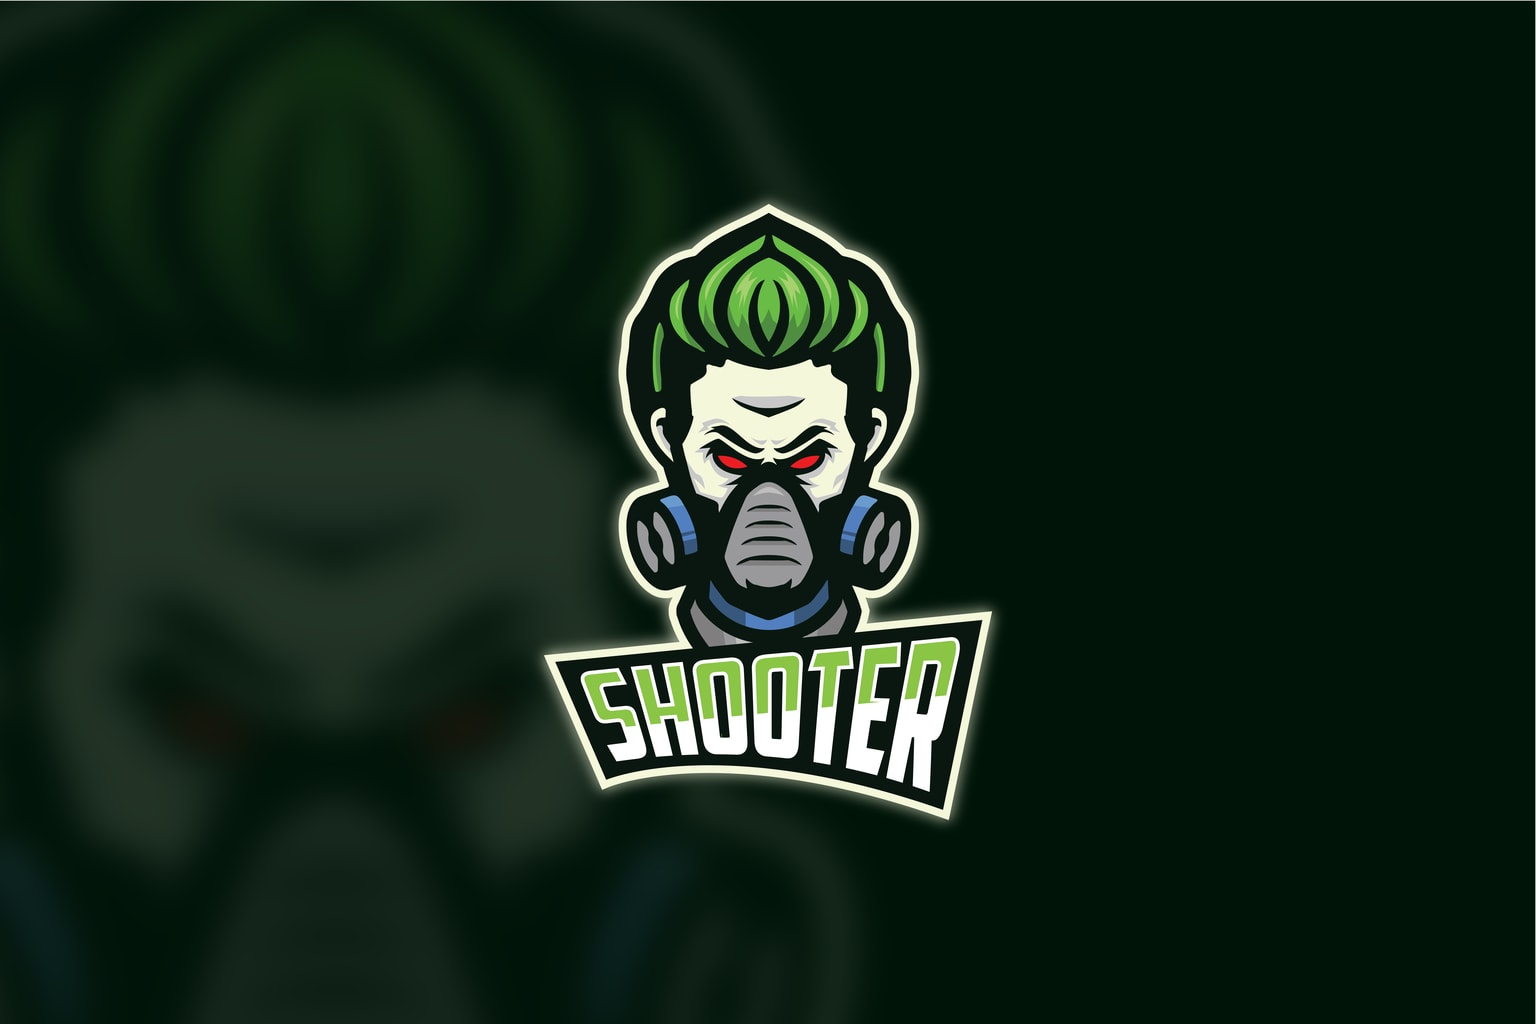 esport logo expert marksman